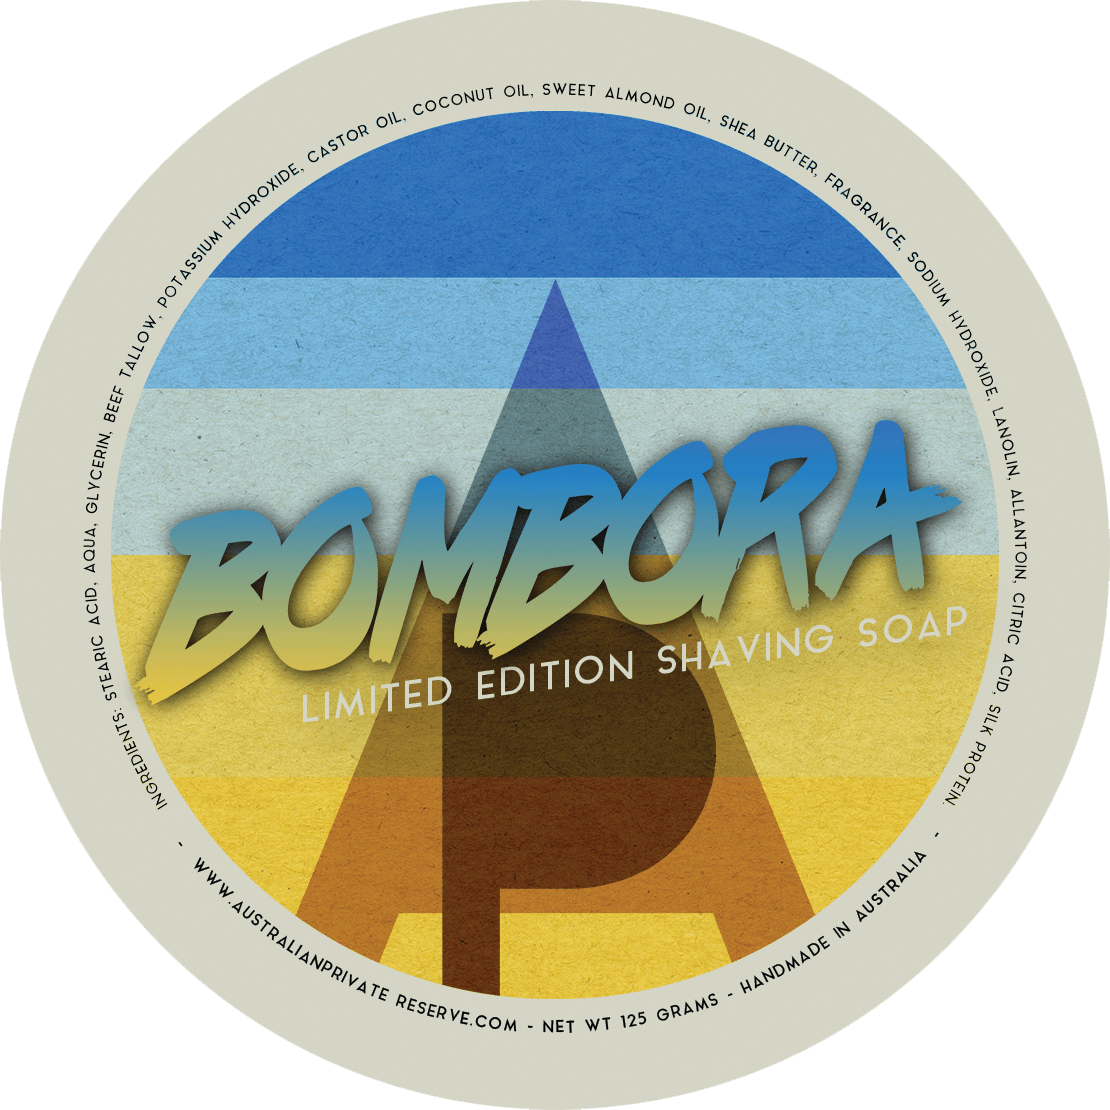 Australian Private Reserve - Bombora - Soap image